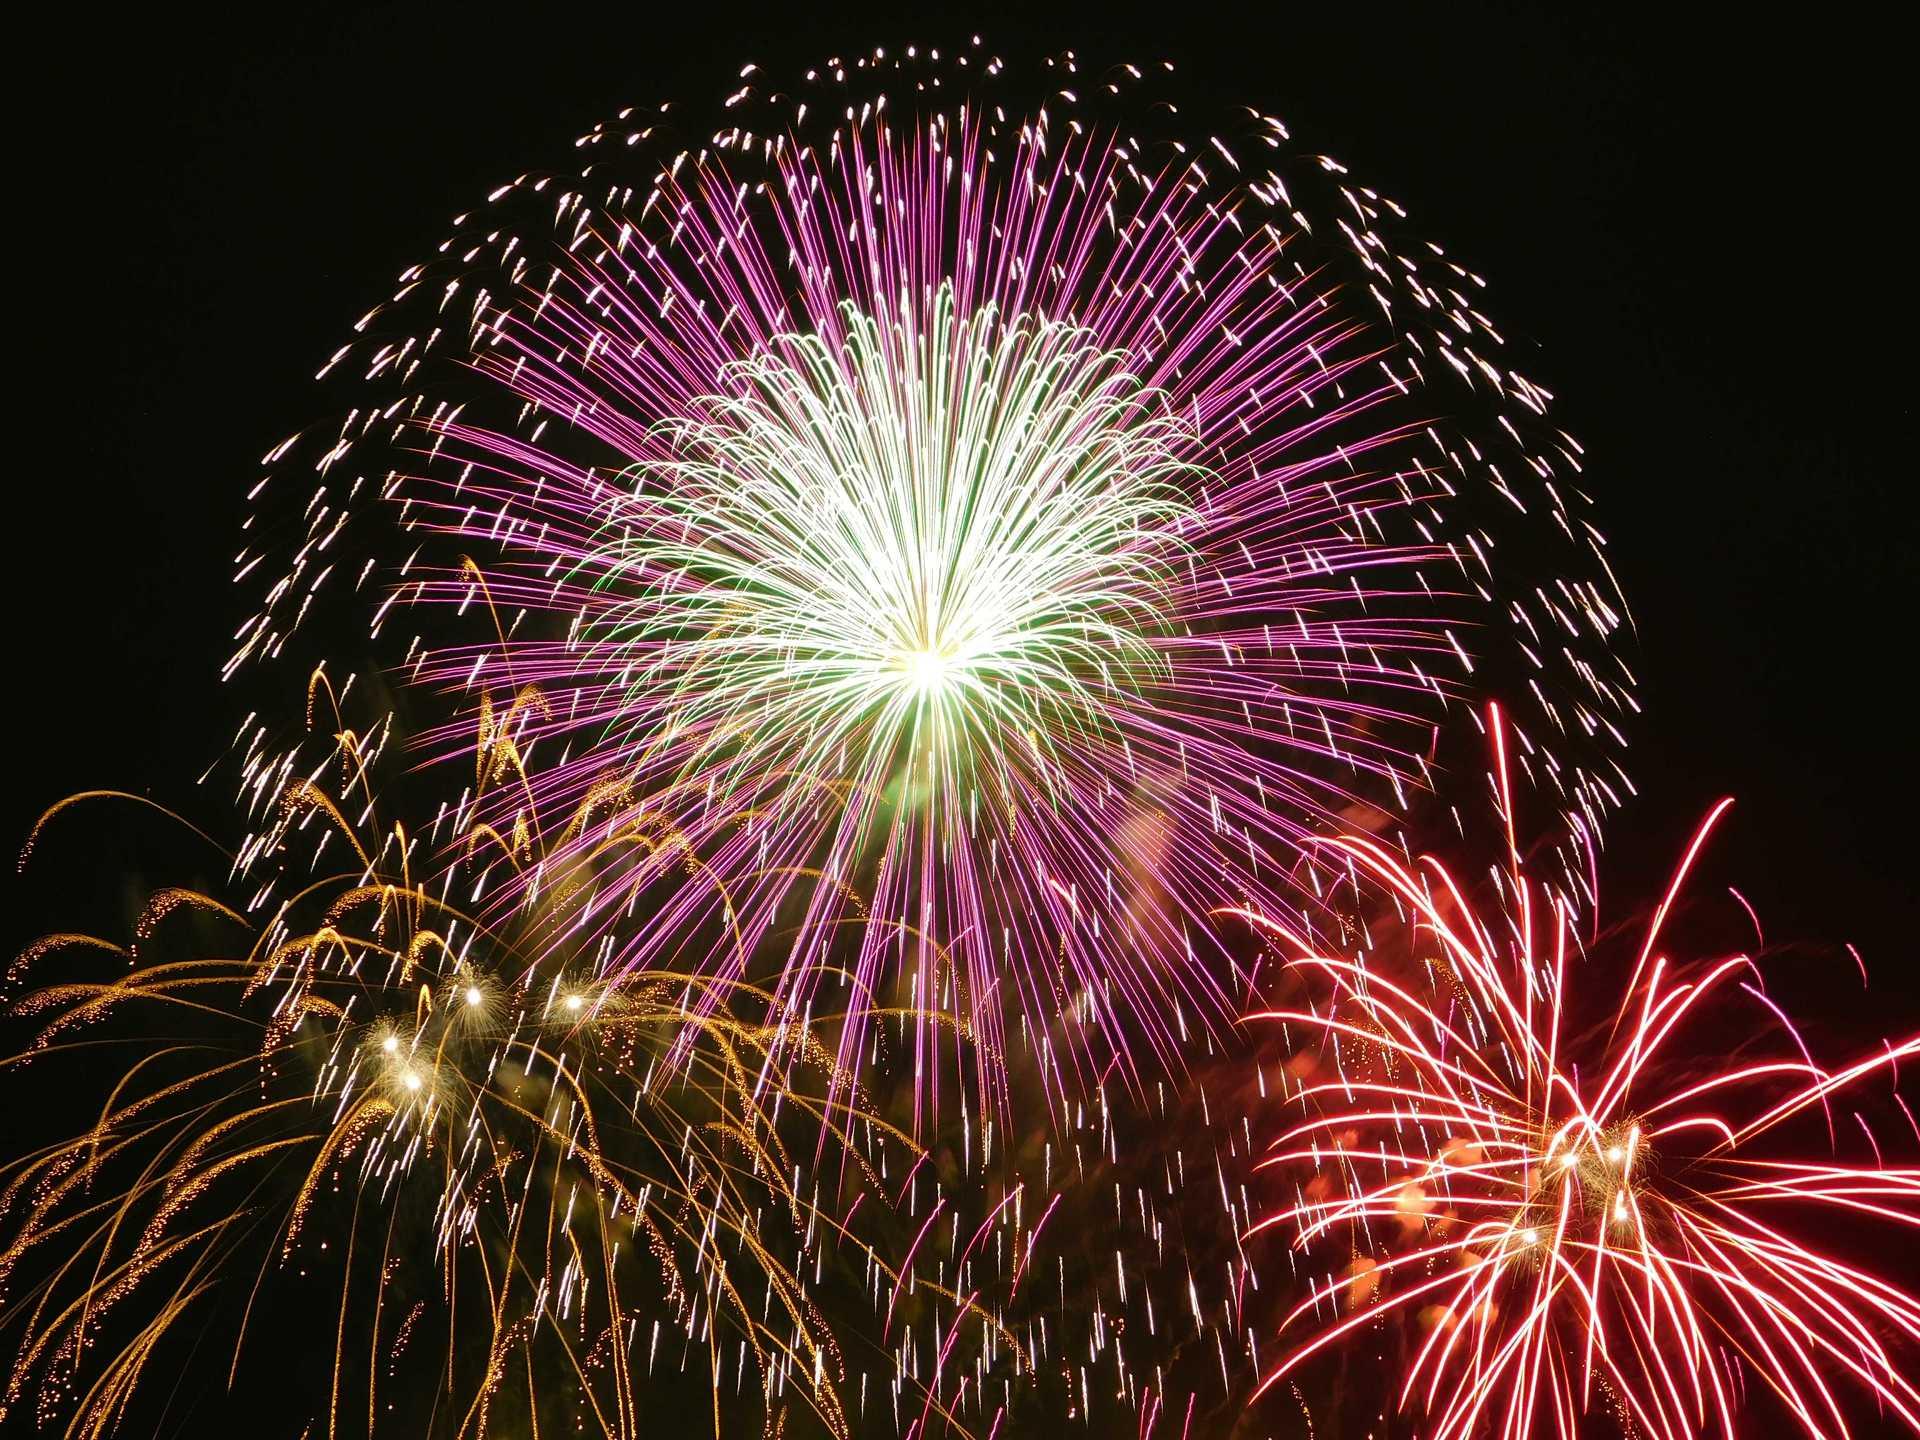 Fireworks | rick.cognyl.fournier, bright, celebration, color